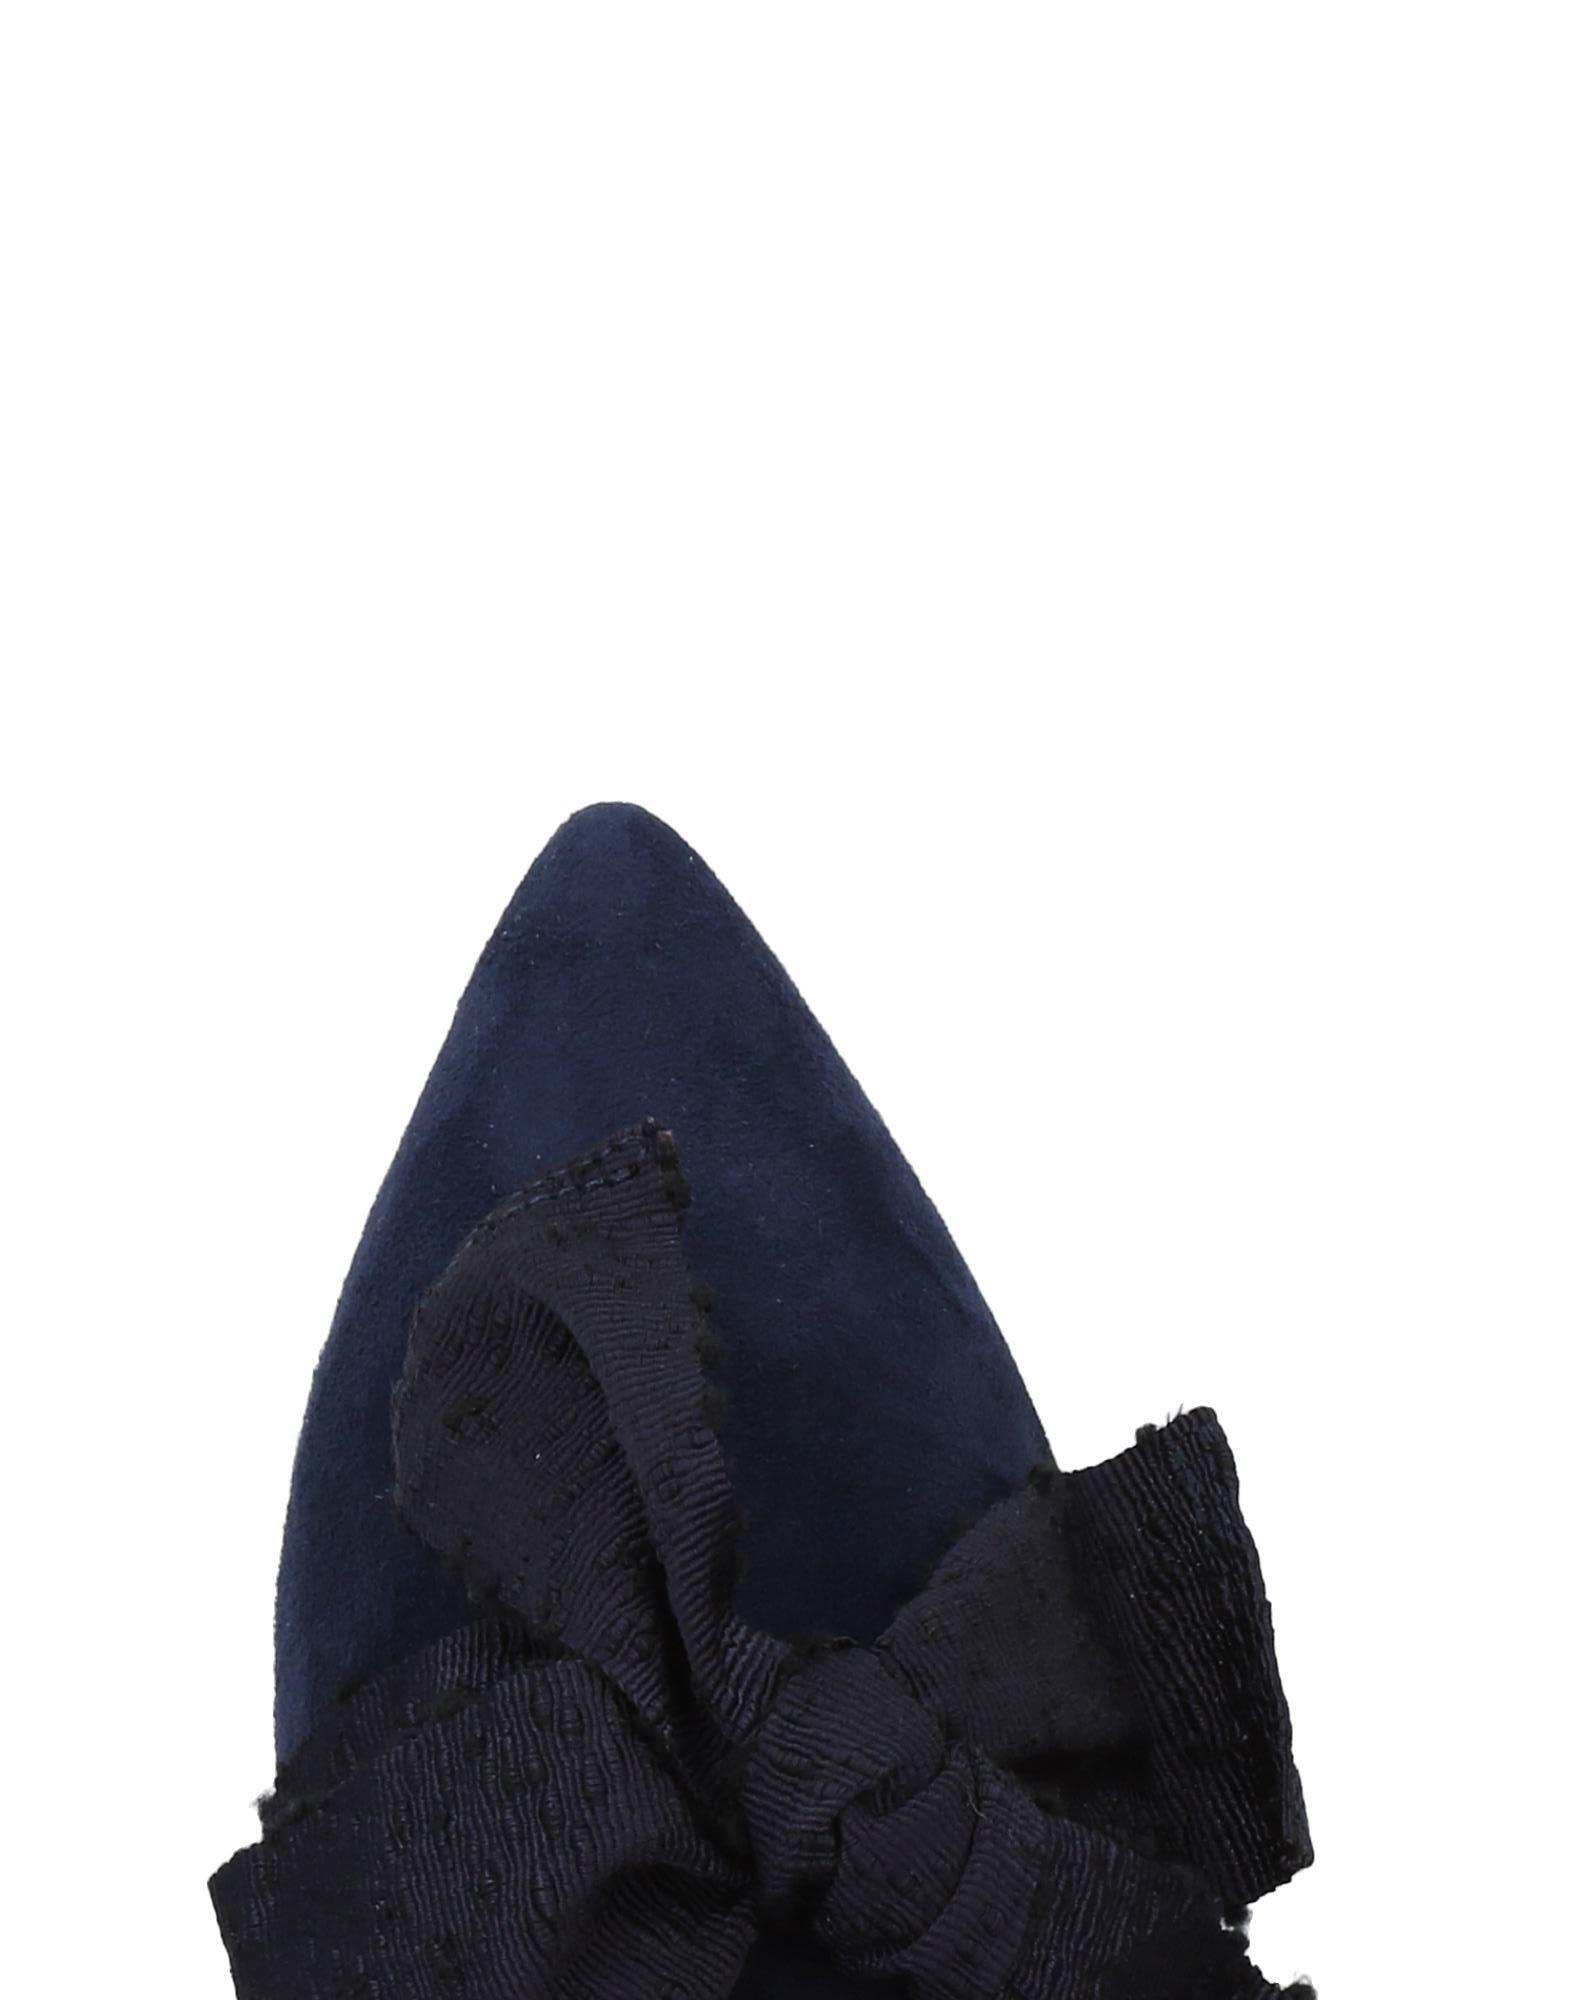 Stilvolle billige Schuhe Schuhe billige Agl Attilio Giusti Leombruni Mokassins Damen  11456451KA 70f946